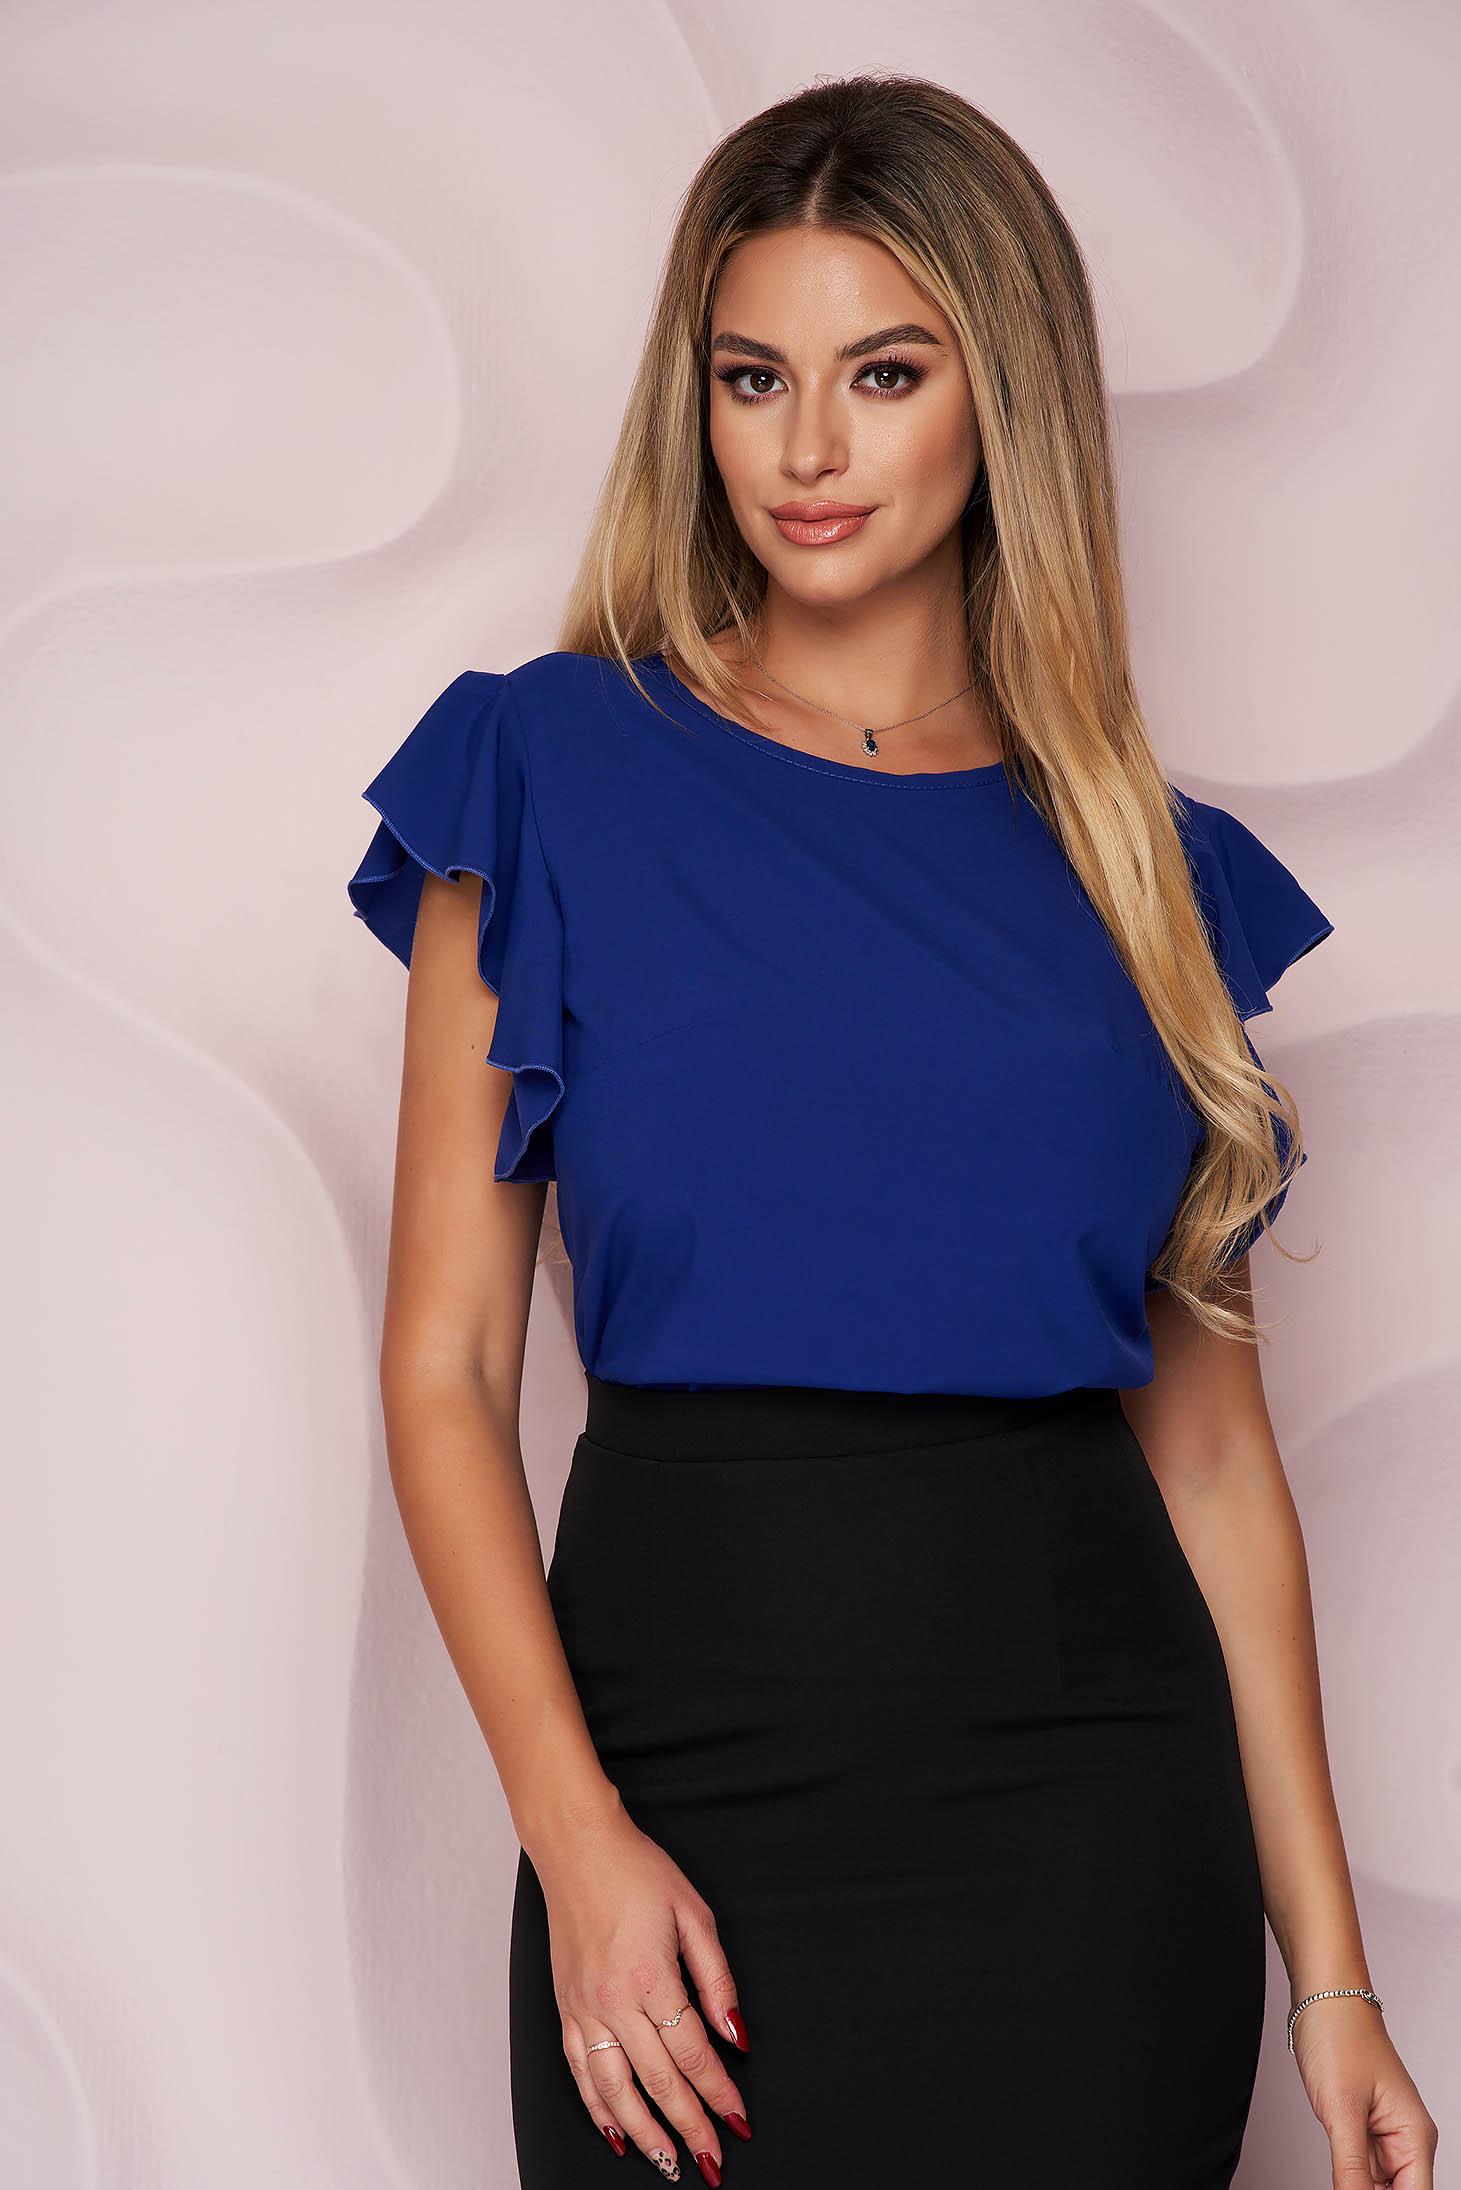 Bluza dama StarShinerS albastra office cu croi larg din material fluid cu volanase la maneca